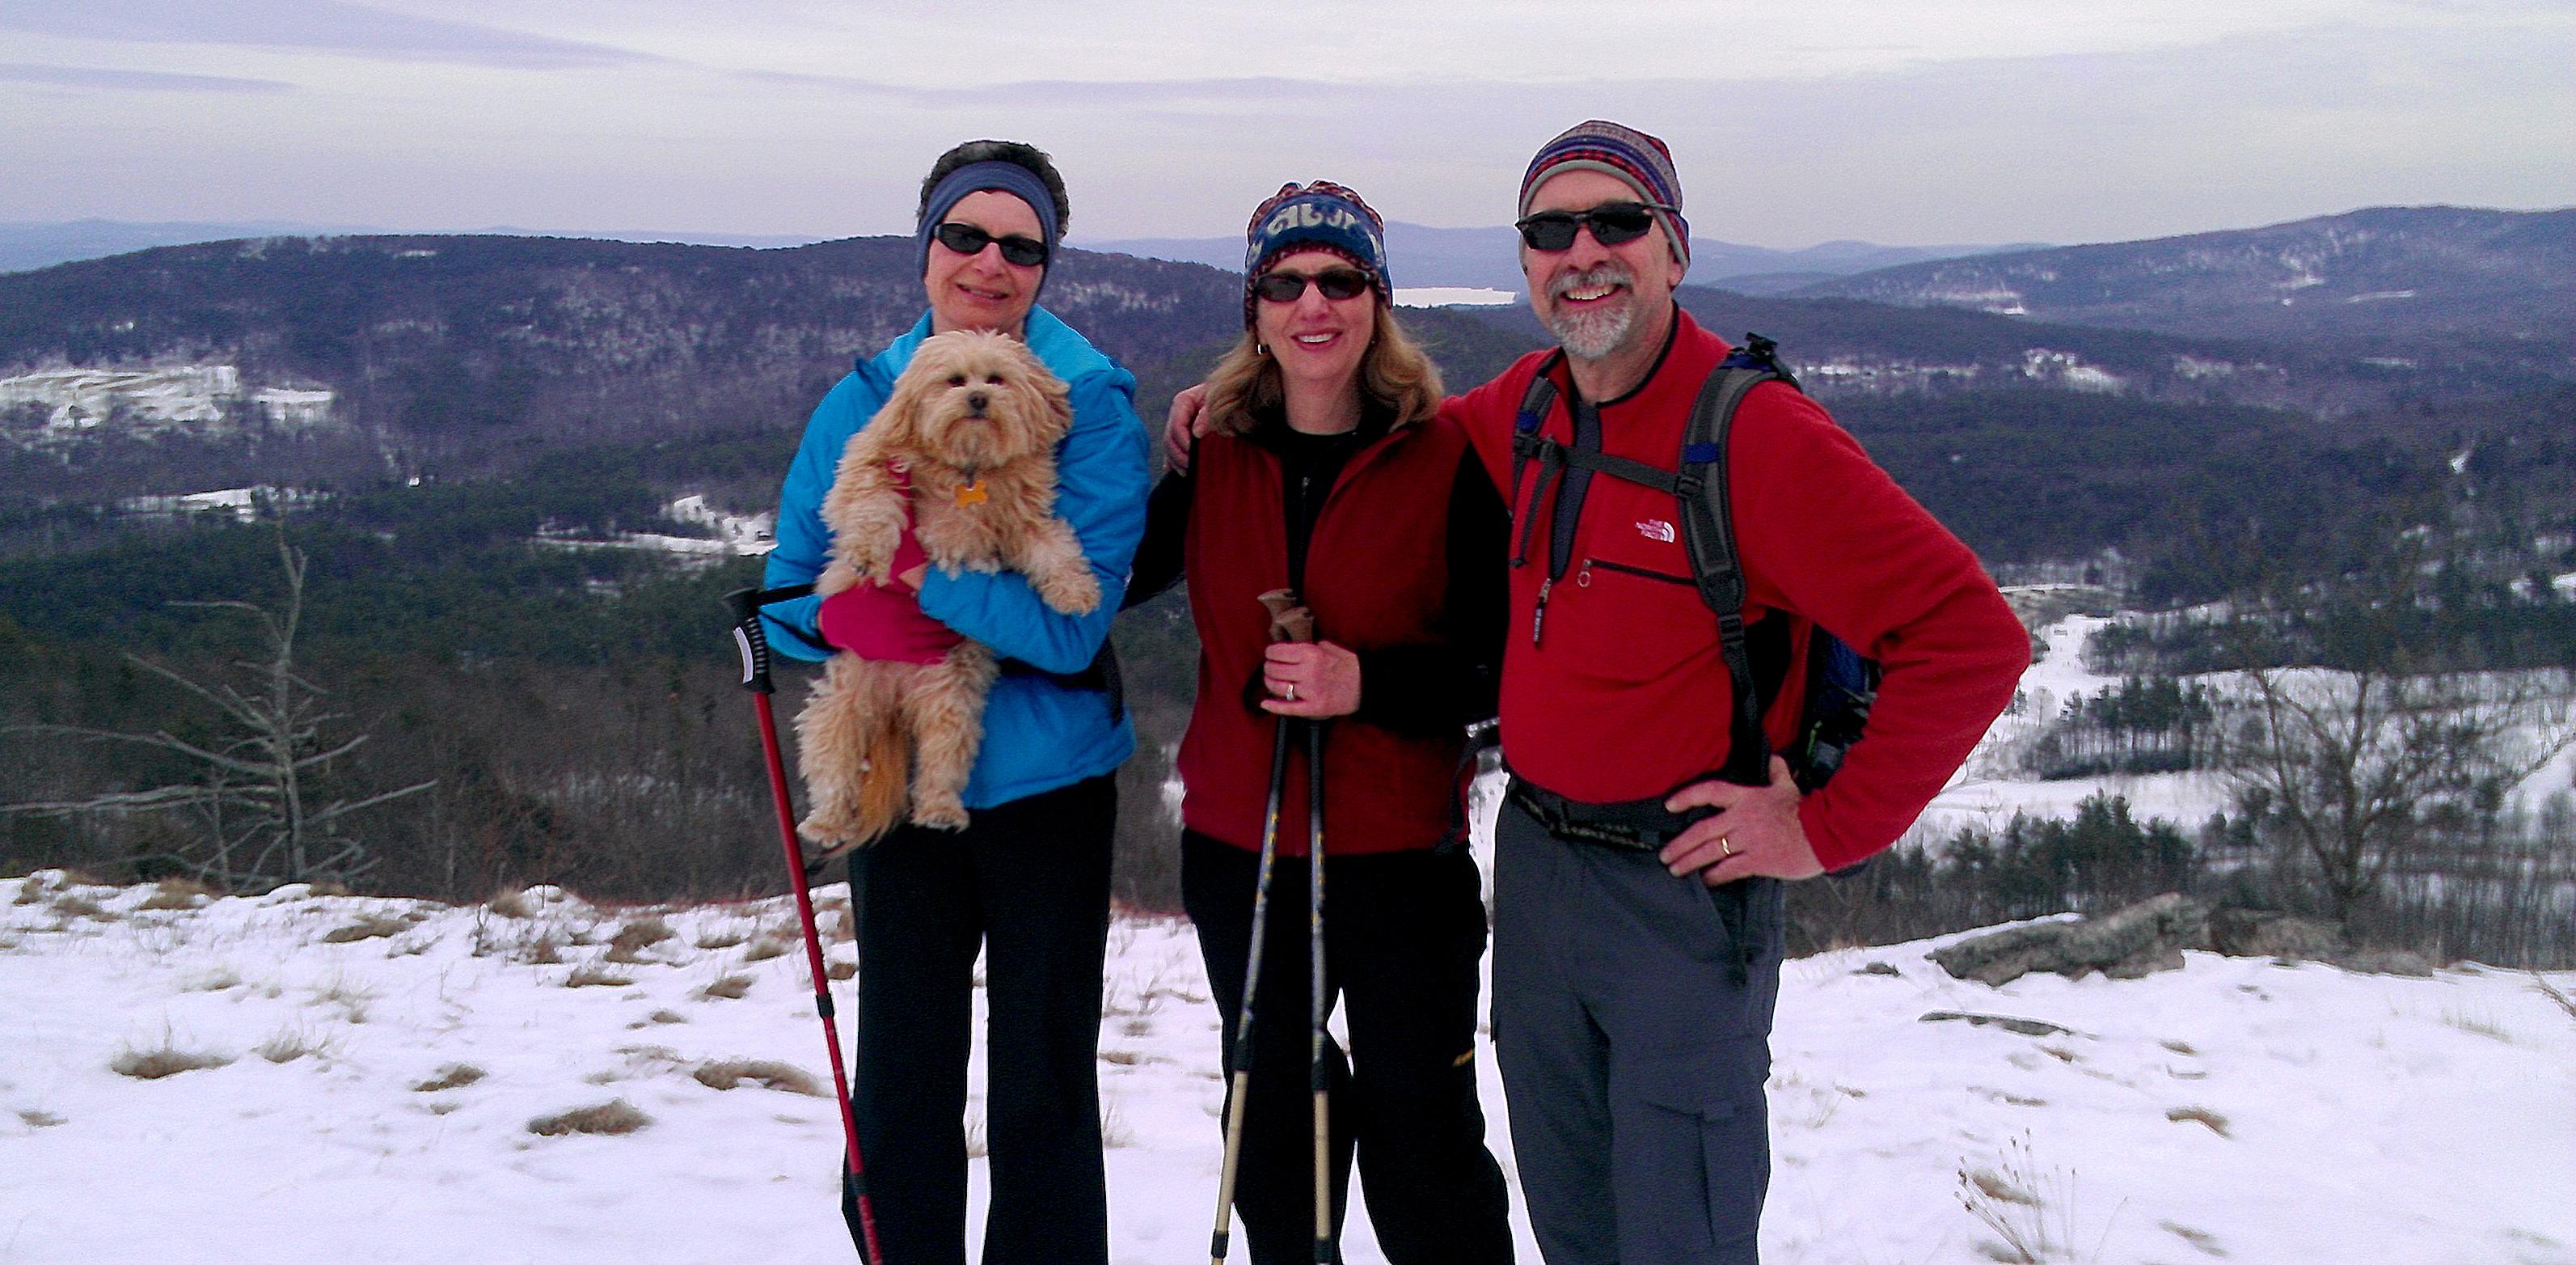 Everett Winter Hike to peak of Mount Rowe